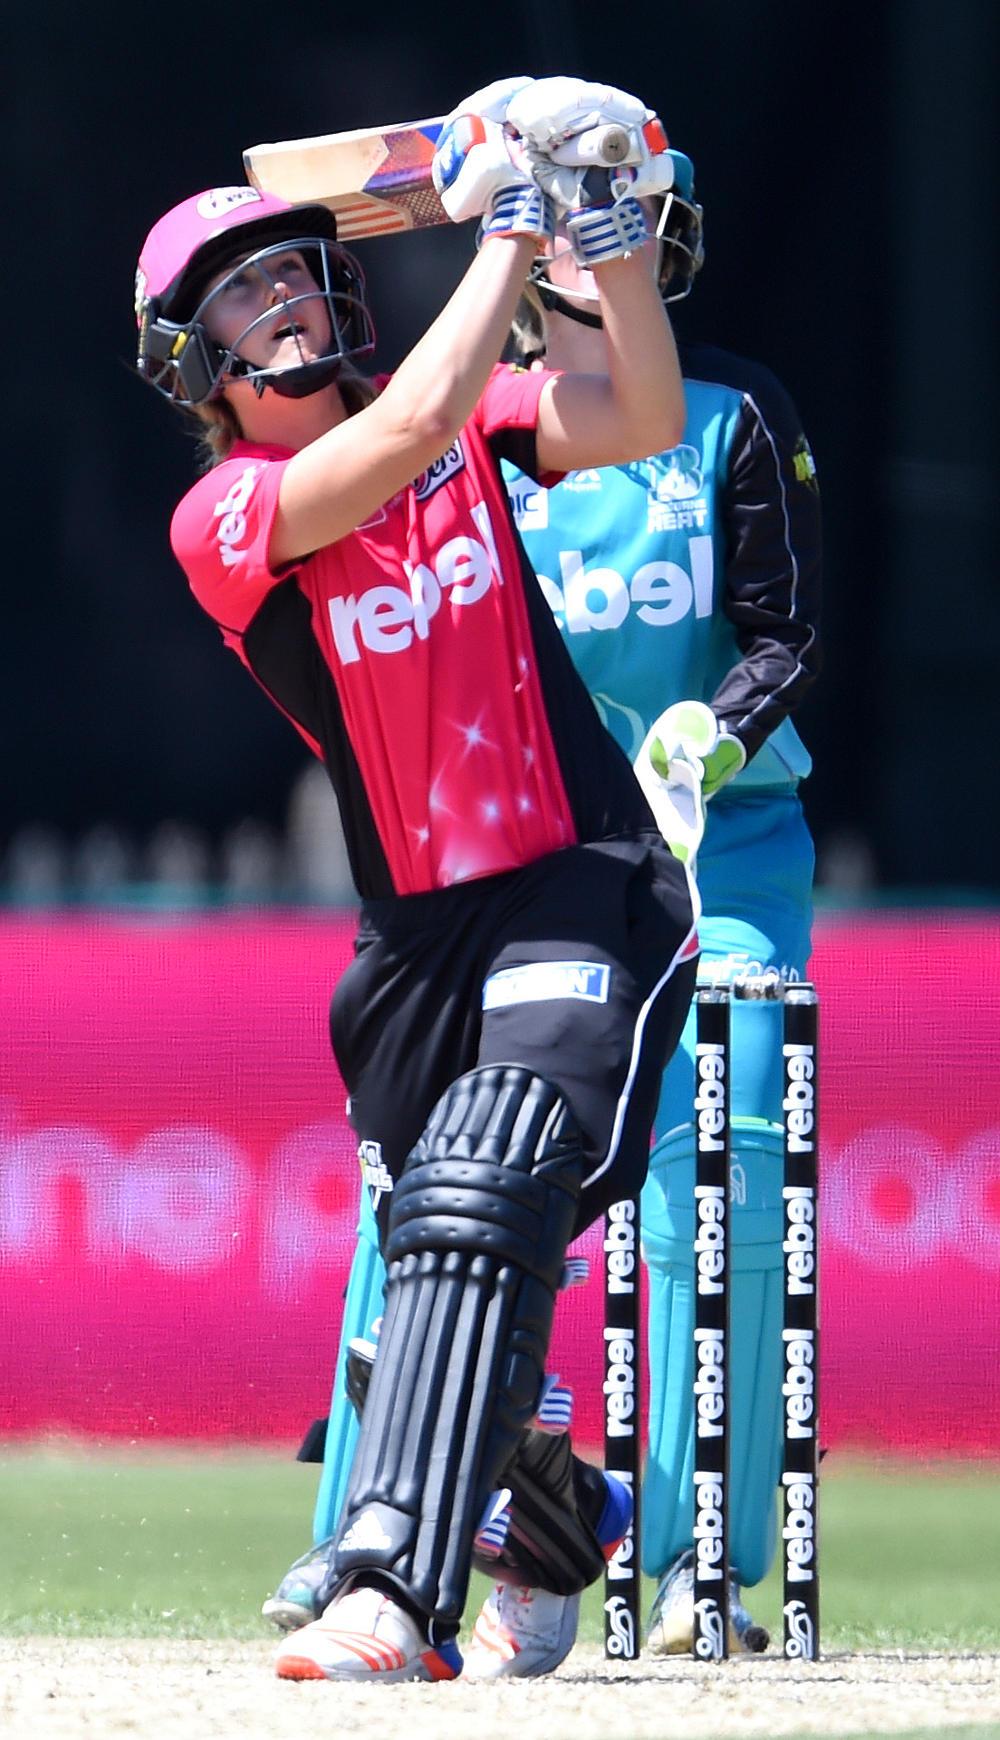 Ellyse Perry batting Sydney Sixers WBBL